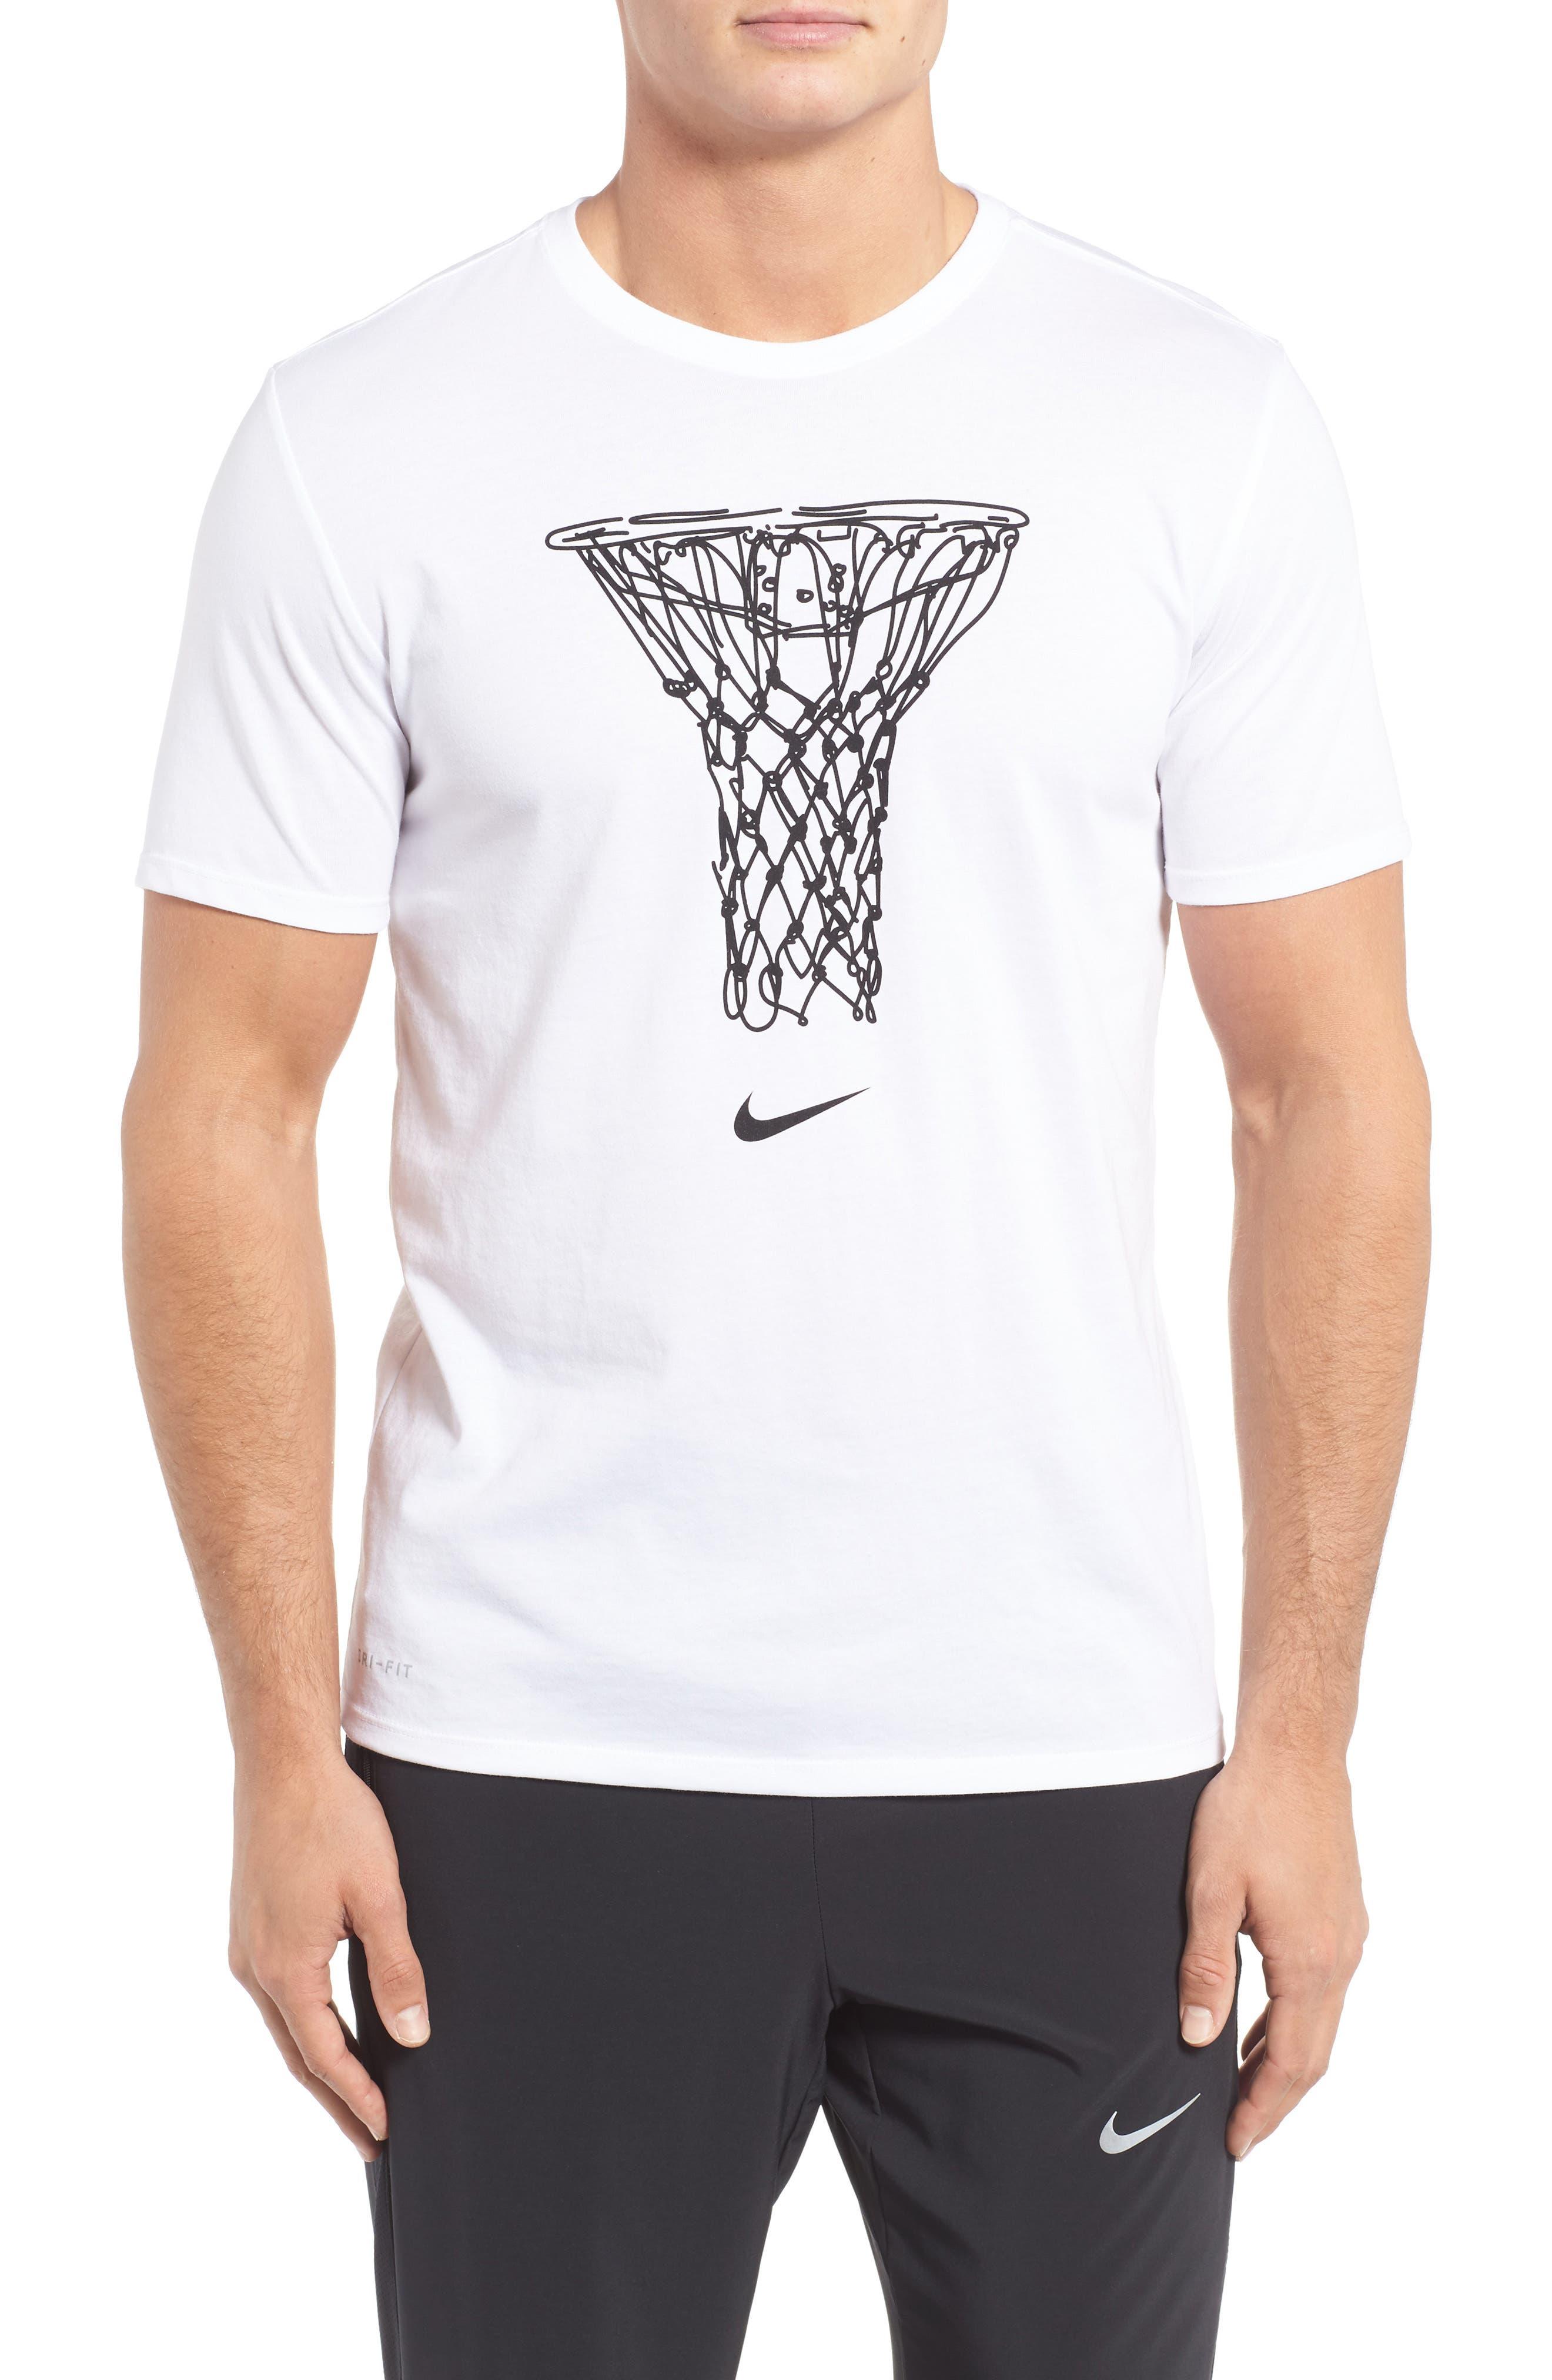 NIKE Dry Basketball Graphic T-Shirt